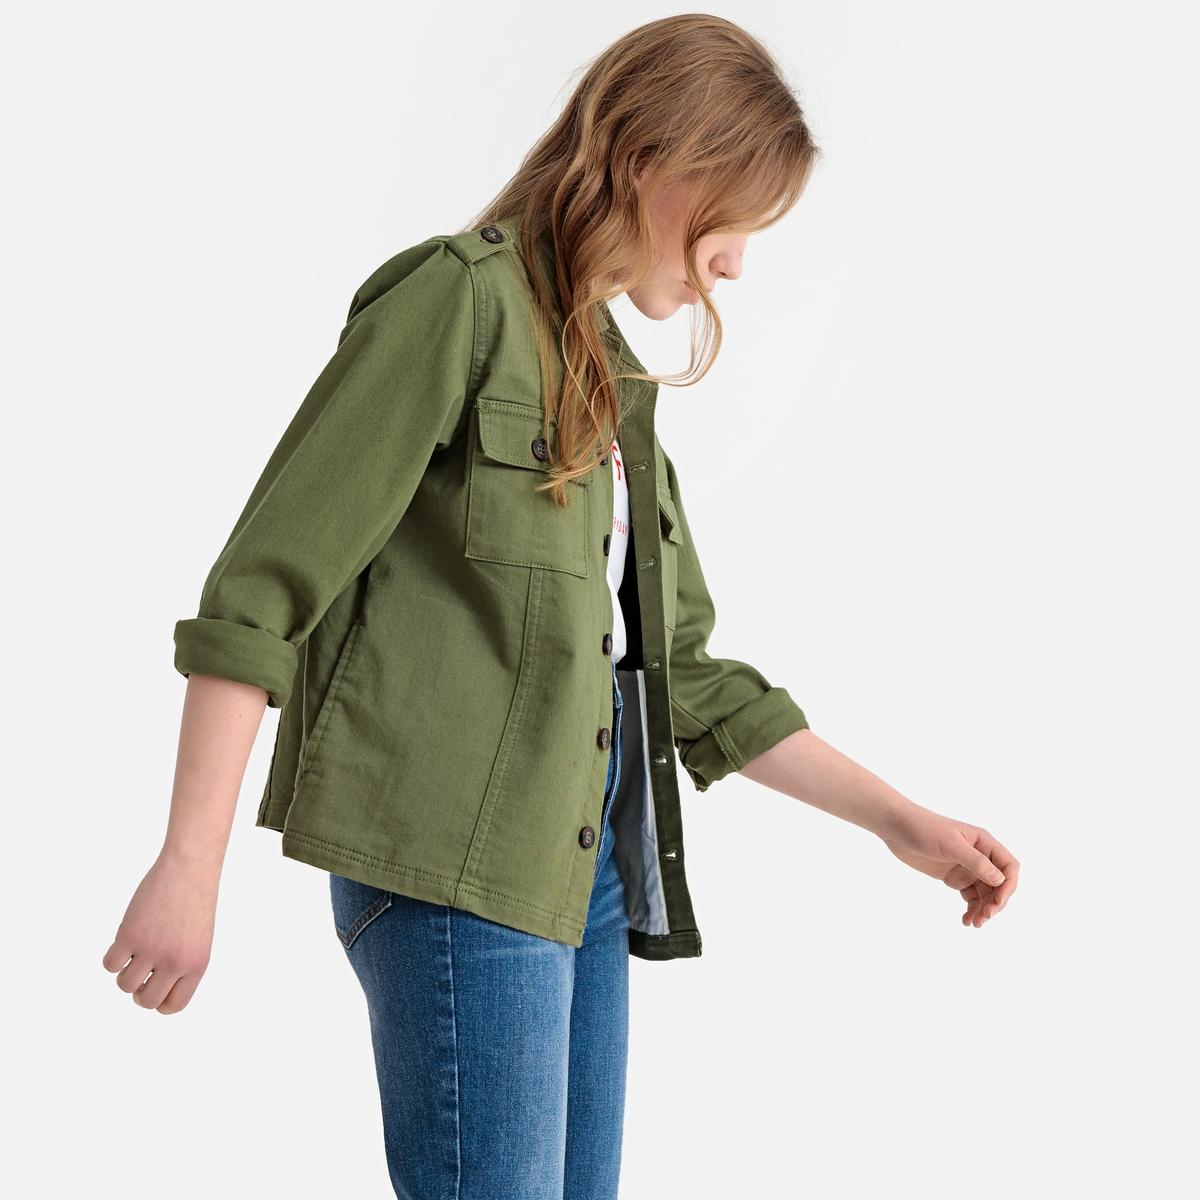 Жакет-сафари La Redoute Демисезонный 10 лет - 138 см зеленый брюки la redoute 10 лет 138 см зеленый